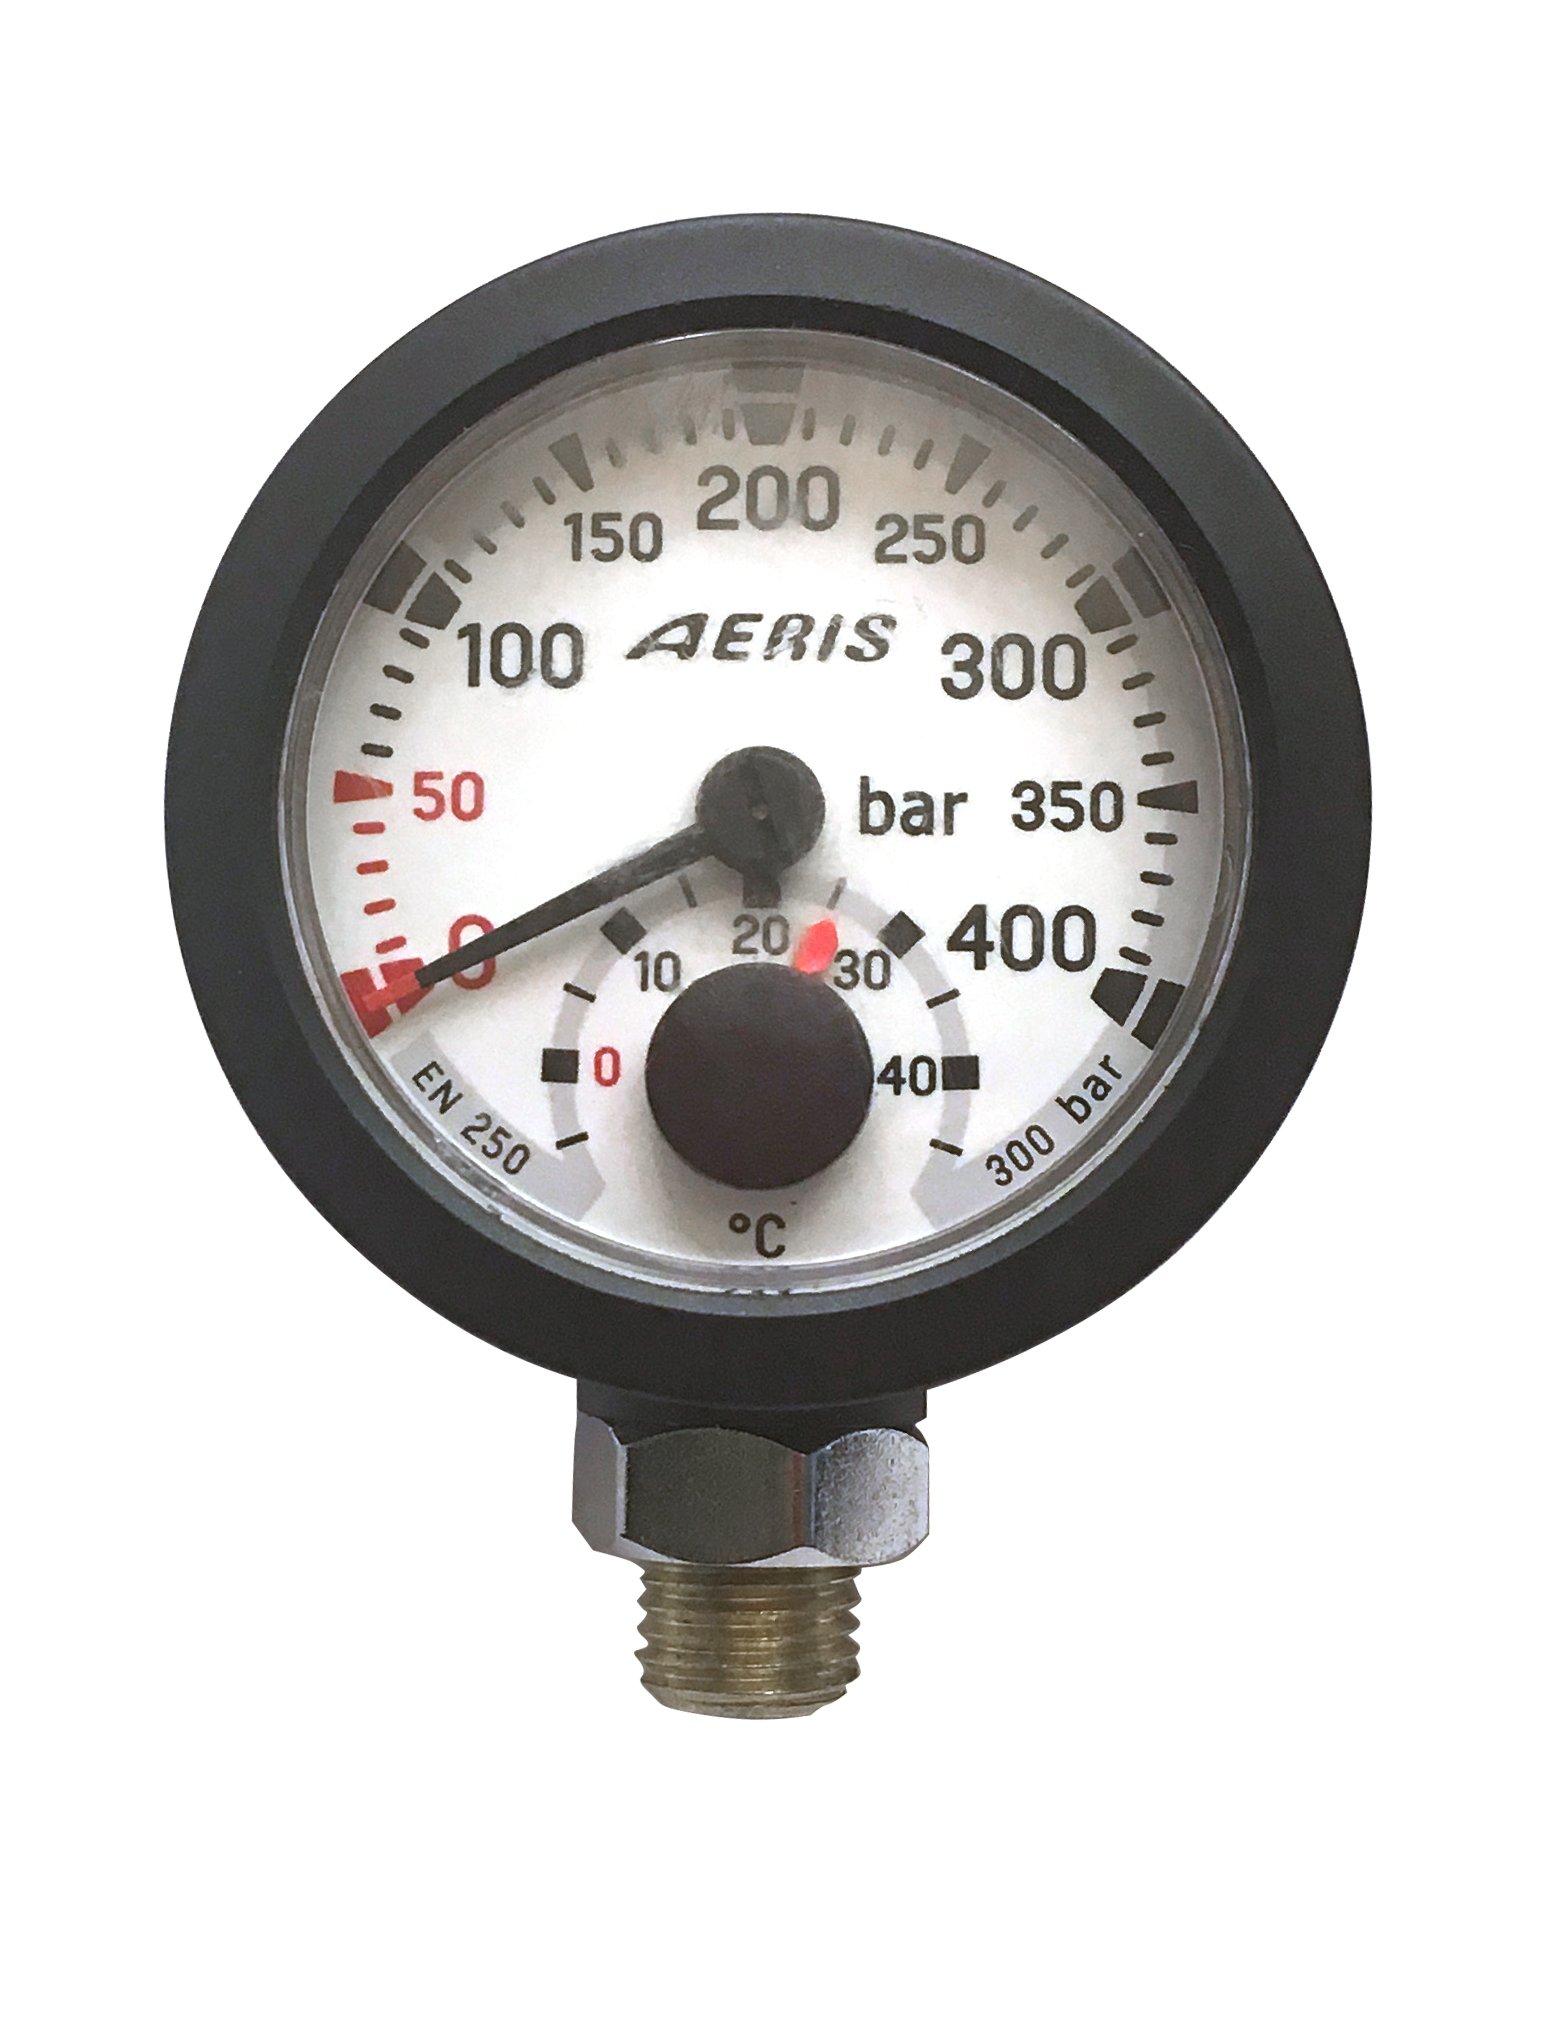 Aeris Metric Standard Submersible Pressure Gauge Module w/ Temperature for Scuba Diving